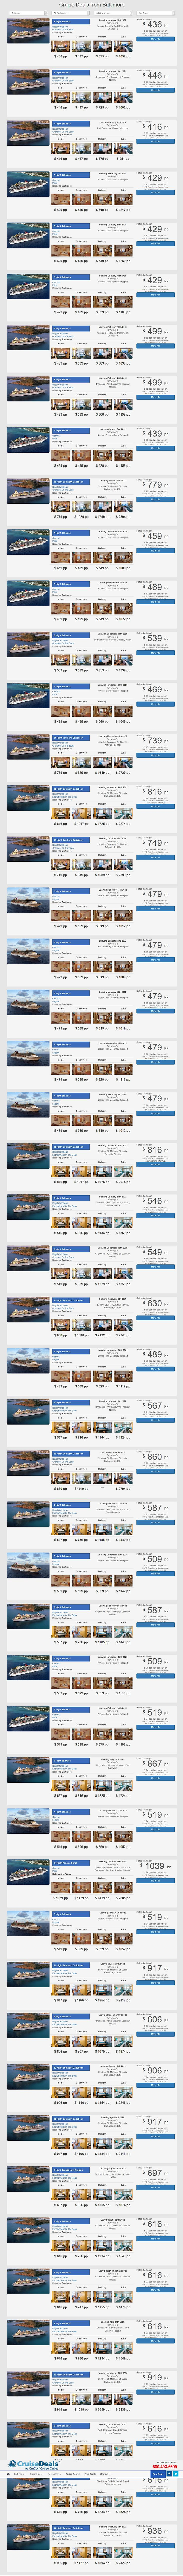 Balt sailings-TLN.png